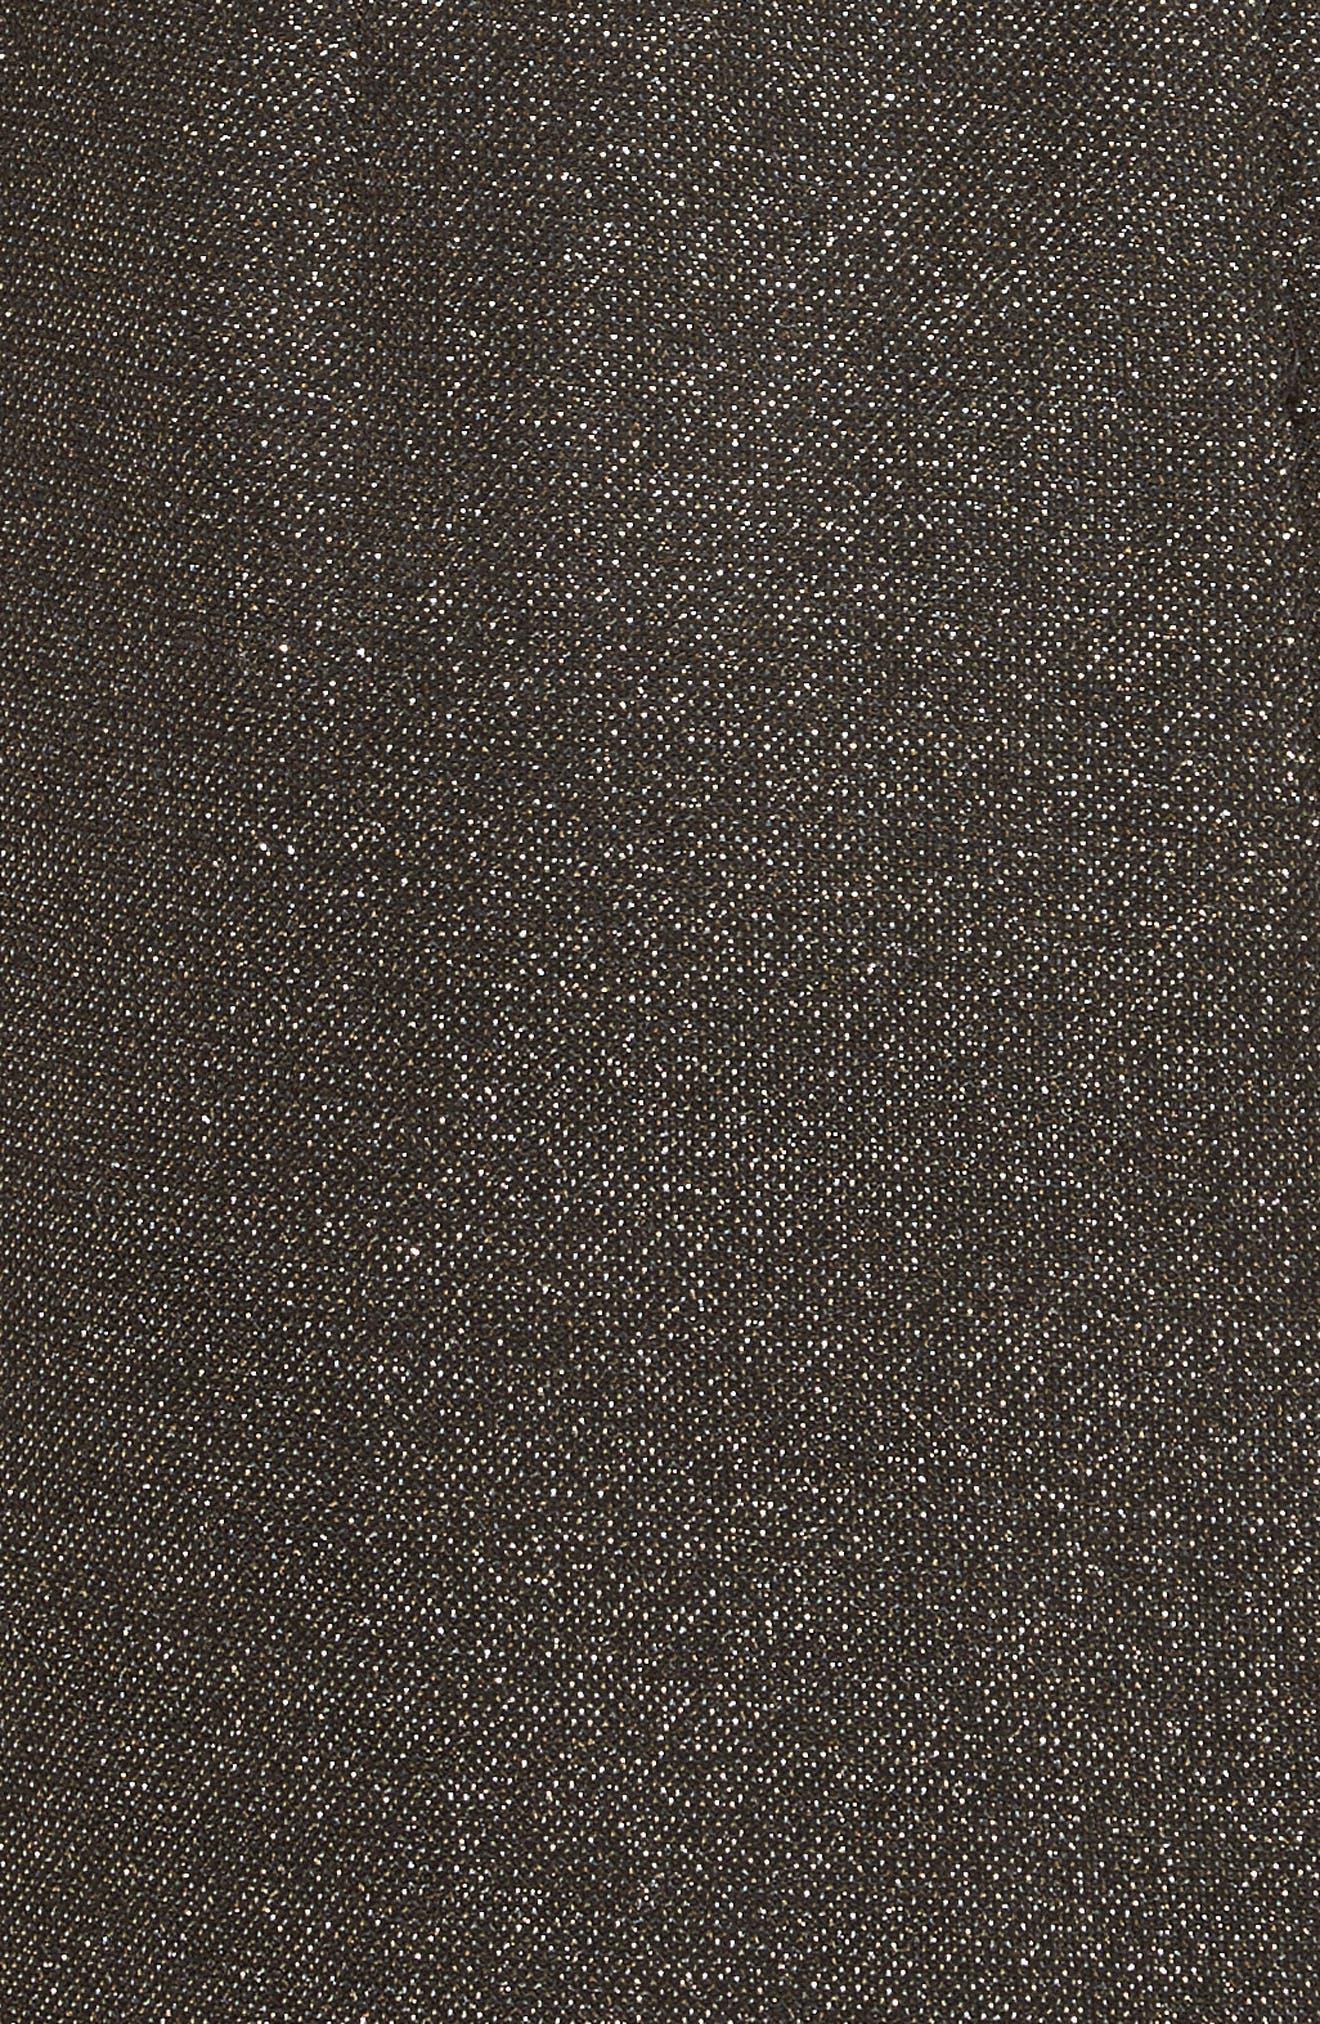 Diane von Furstenberg Sparkle Sheath Minidress,                             Alternate thumbnail 5, color,                             001